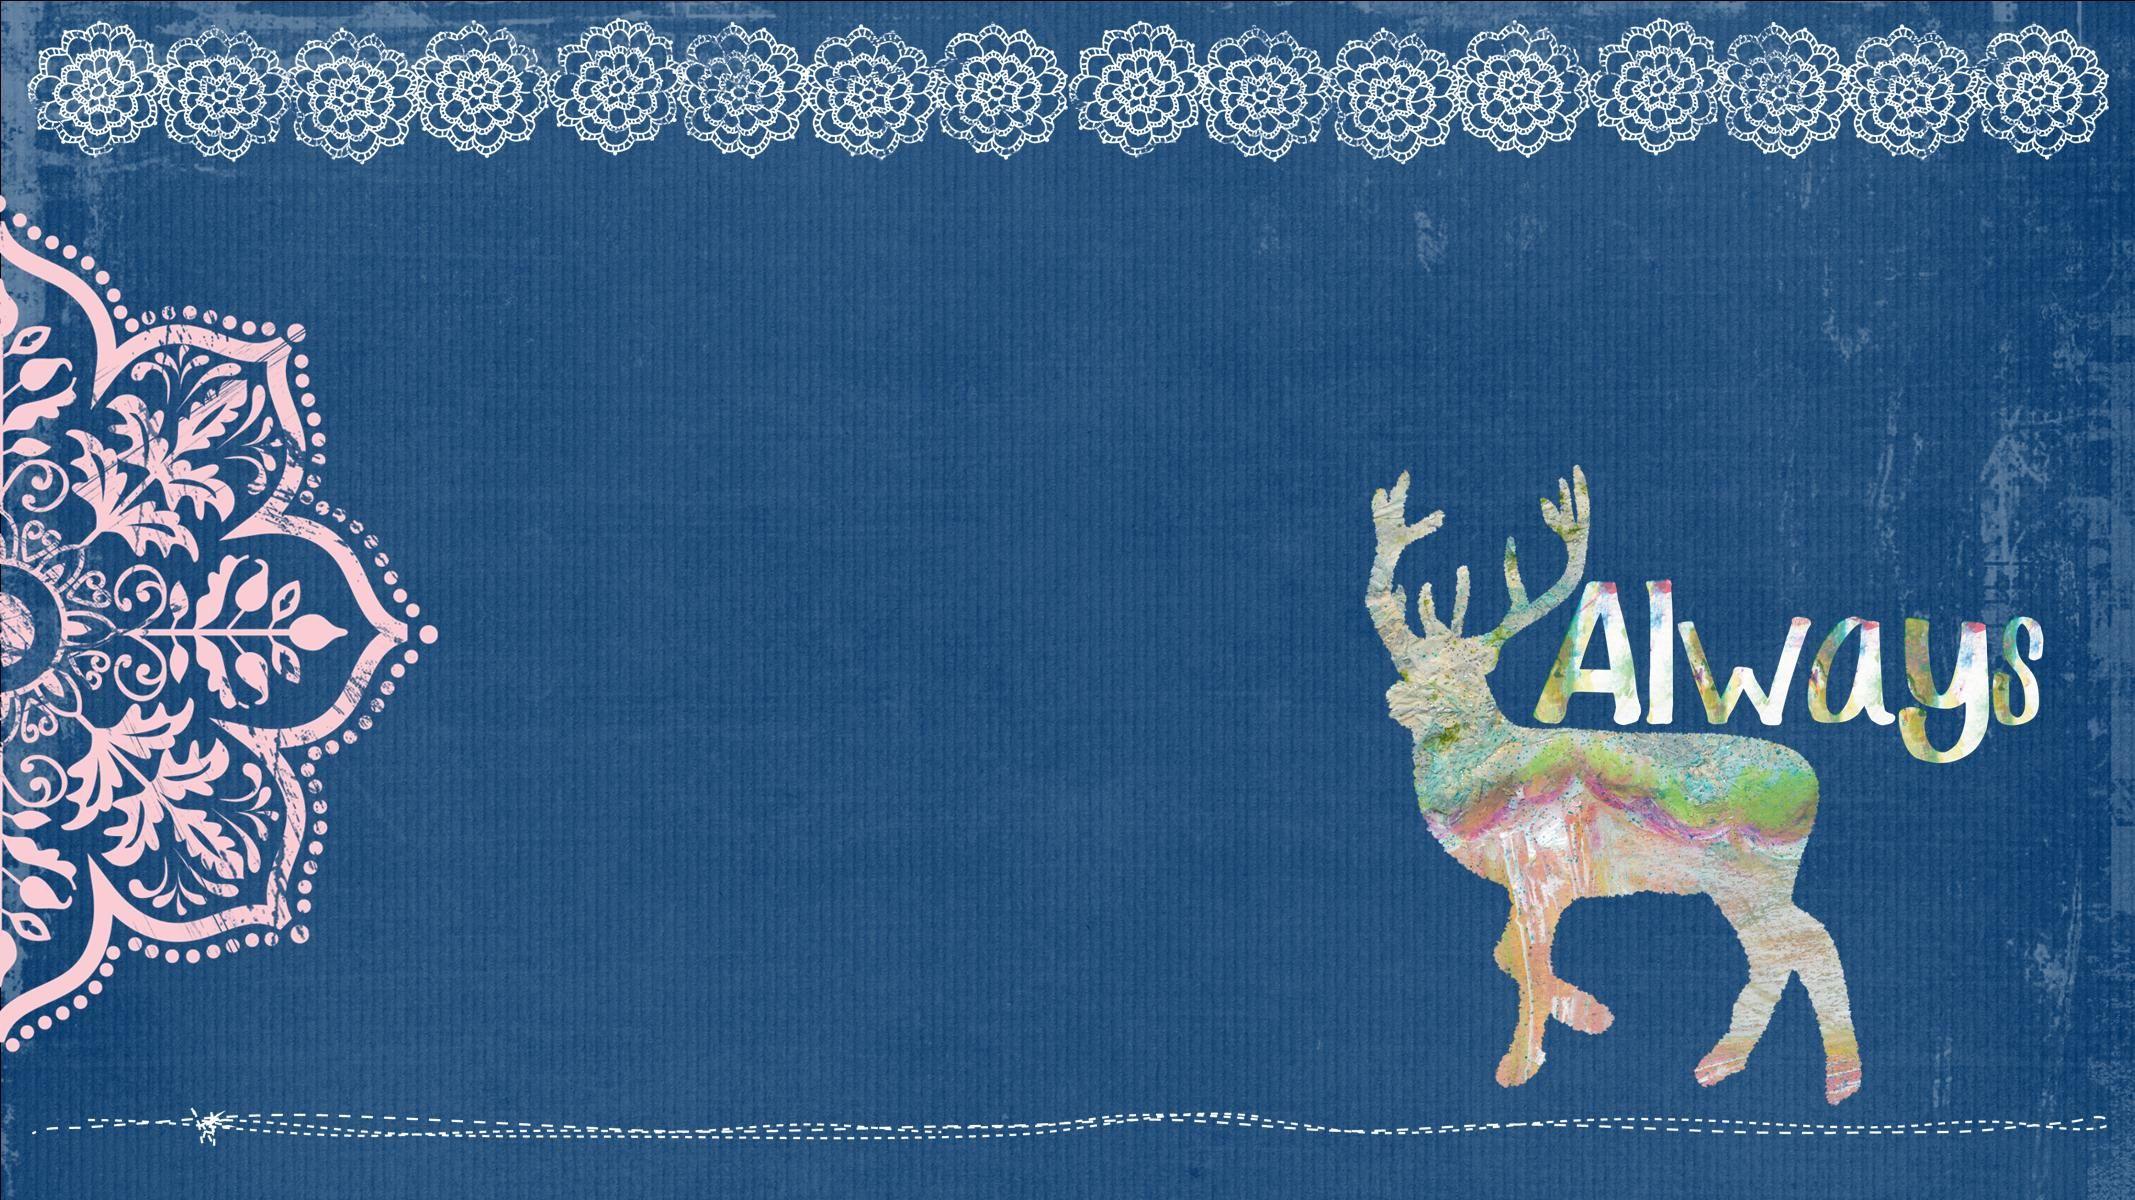 Cool Wallpaper Harry Potter Desktop - e1f7e6ef68060a4033ca34ccee672a0b  Gallery_204635.jpg